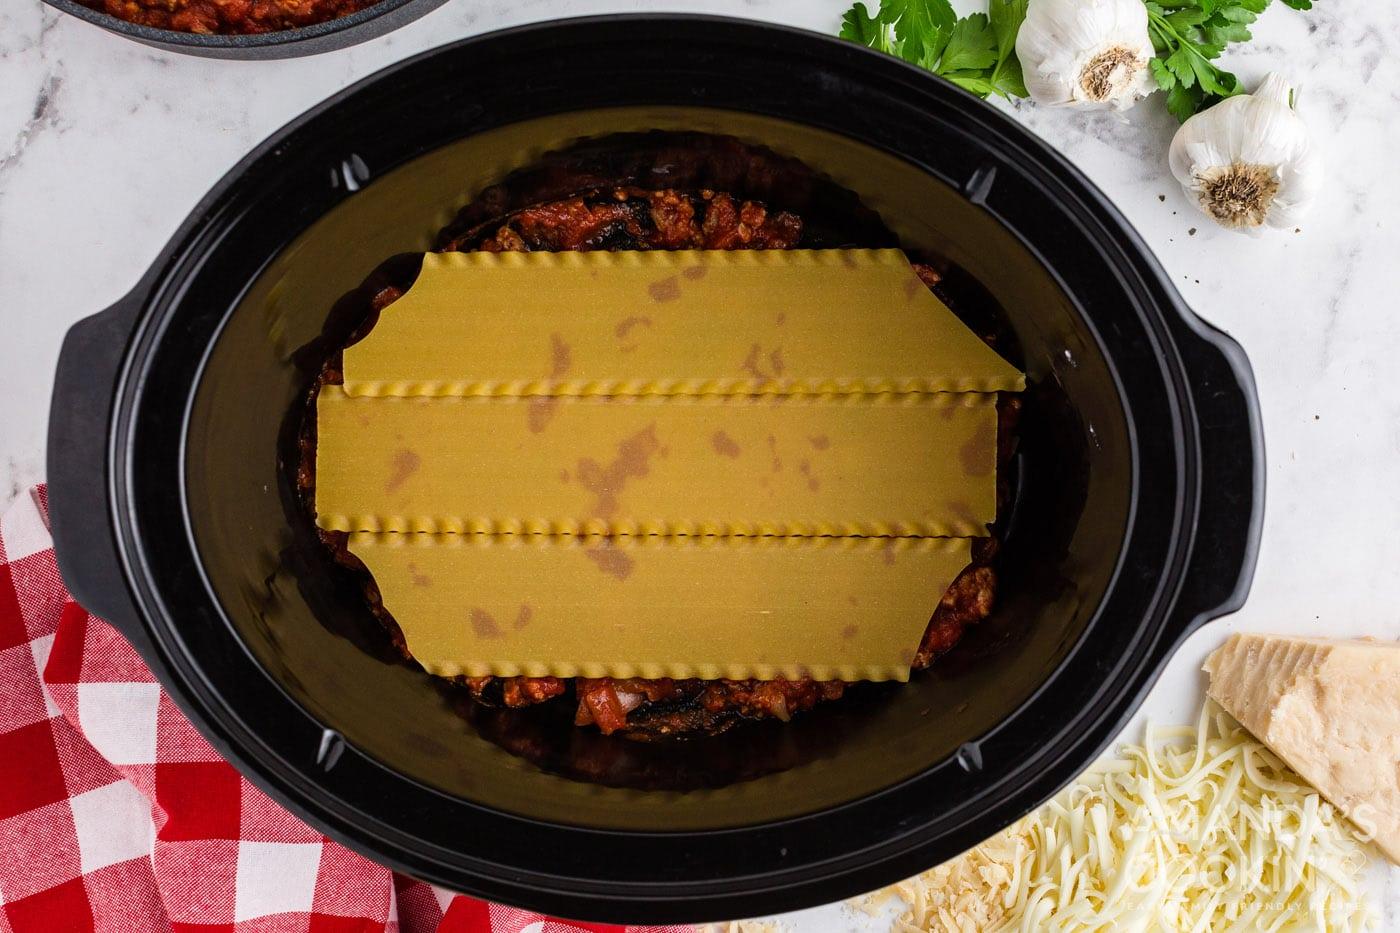 lasagna noodles on top of meat sauce in crockpot